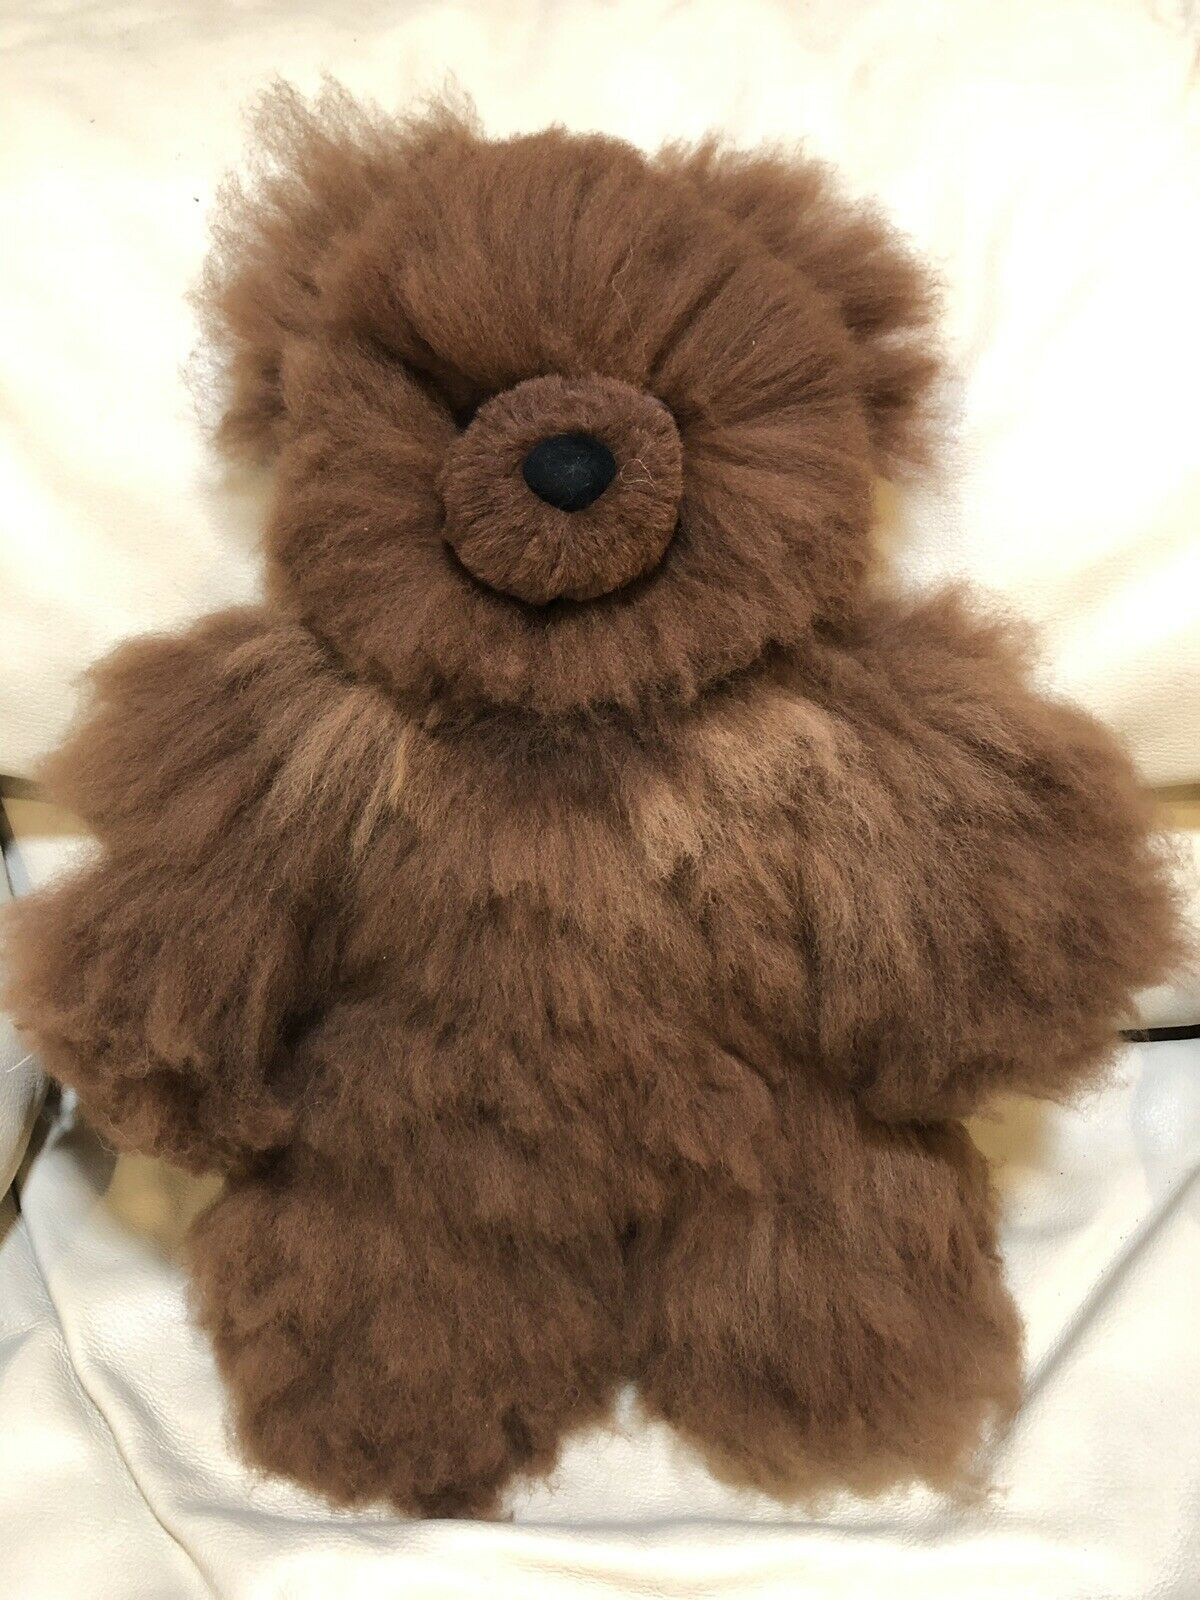 Brand New Soft Baby Alpaca Teddy Bear Handmade In Peru 18 Inches Tall